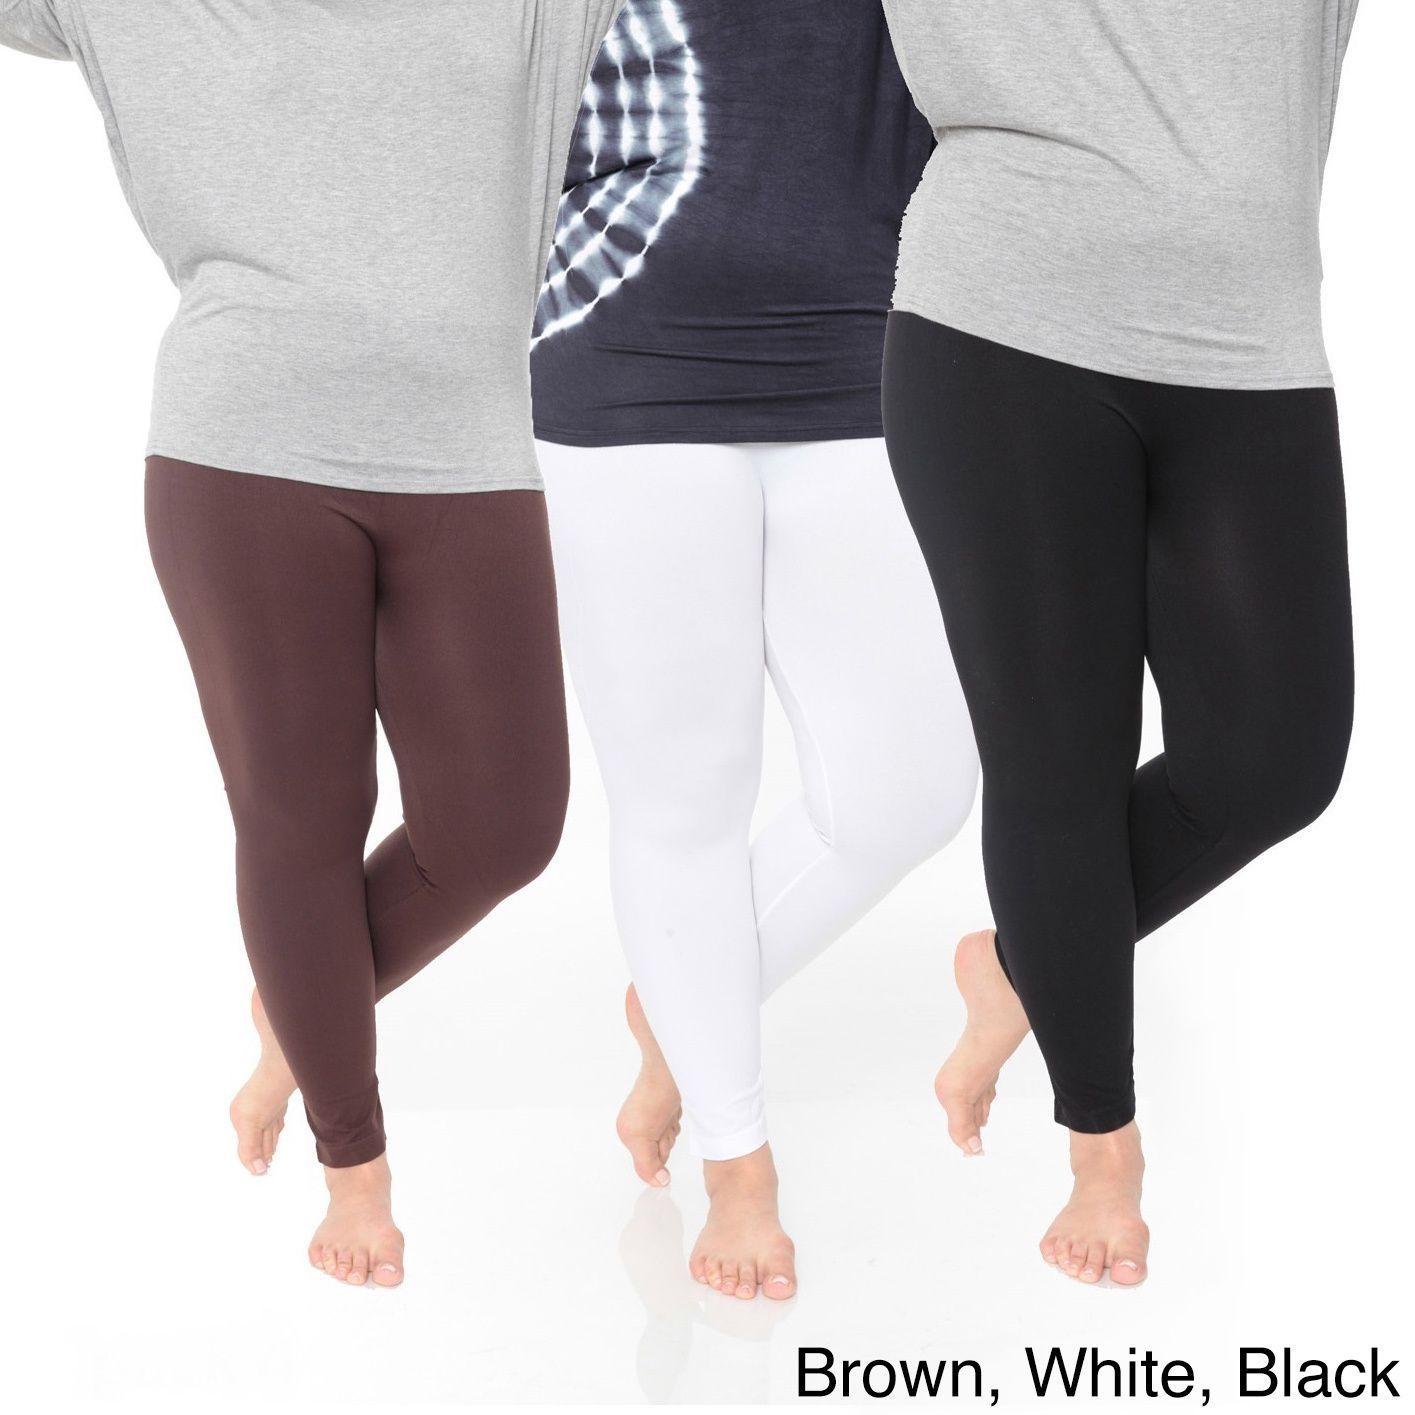 dd0e166bbfa1bc White Mark Women's Plus Size Legging Pack of 3 (White/Brown/Black), Size  One Size Fits Most